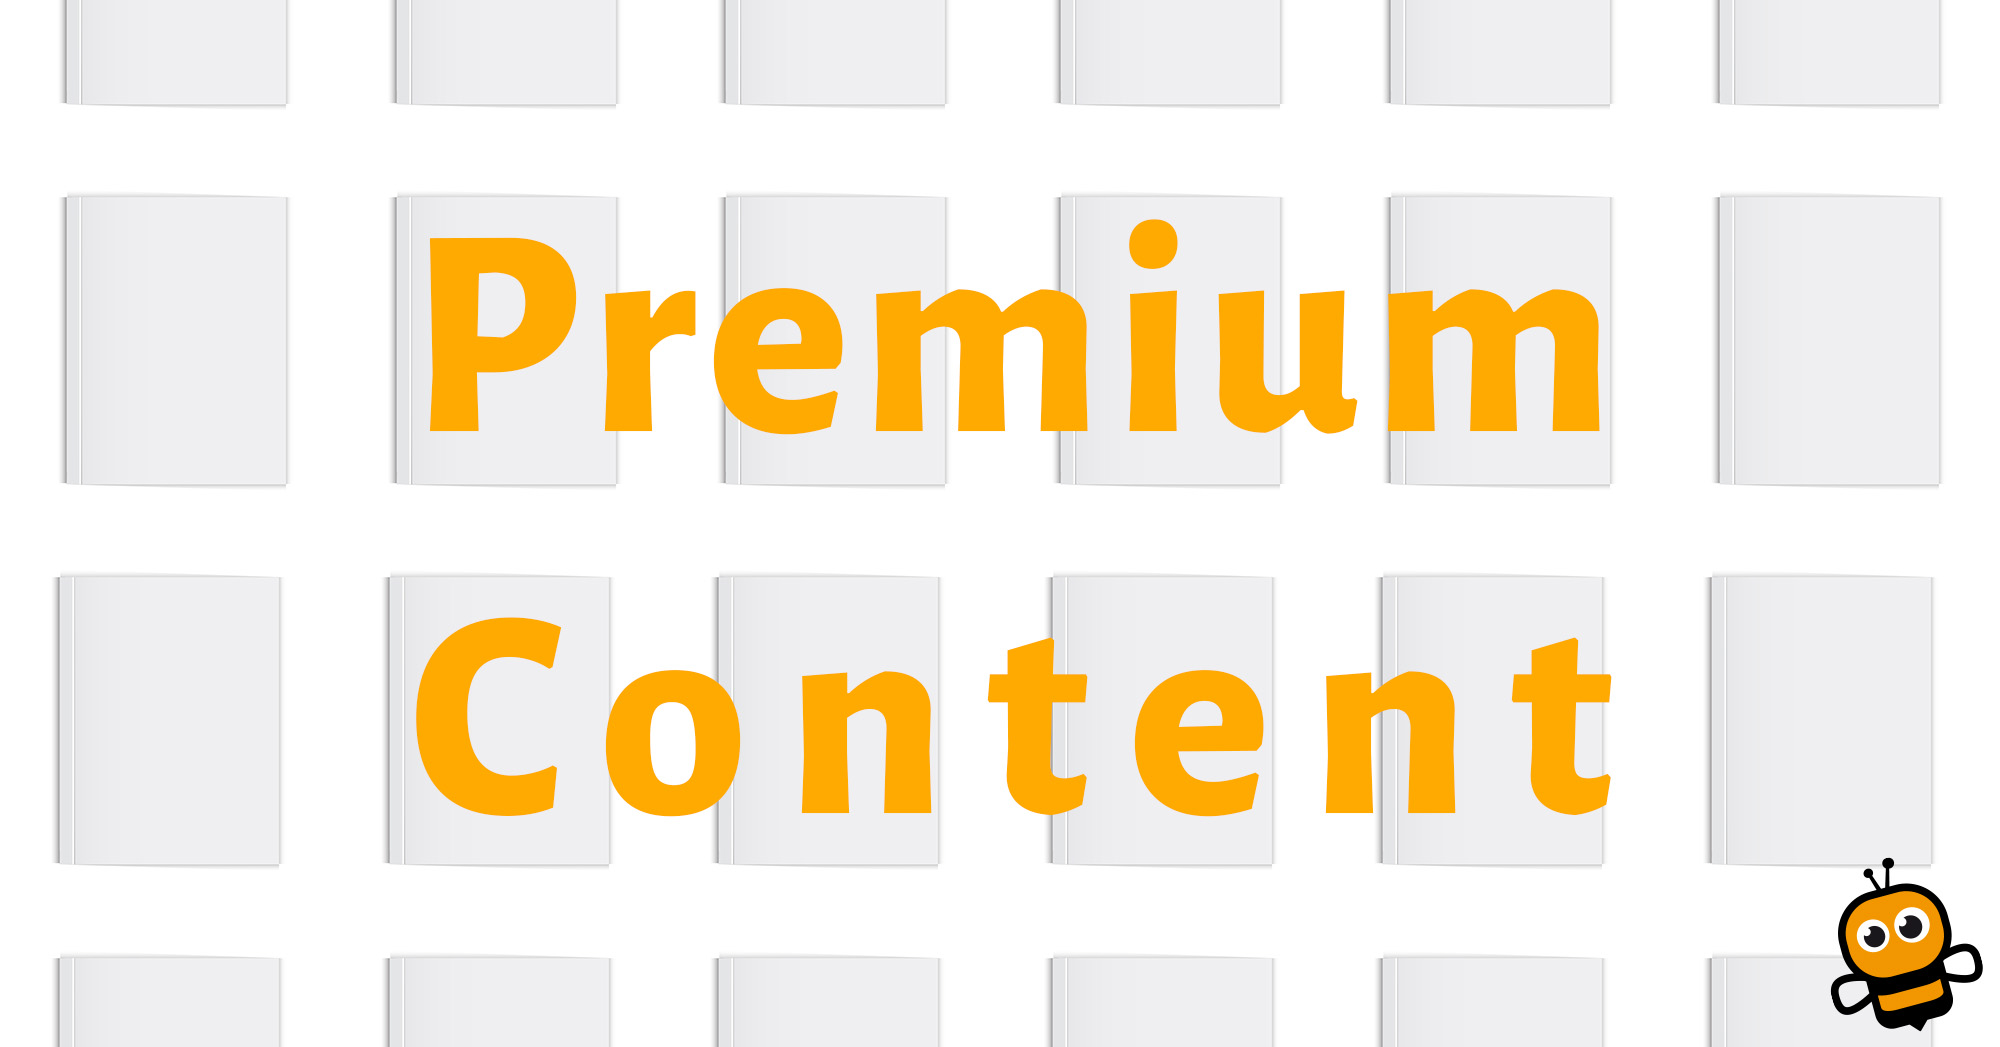 premiumcontent